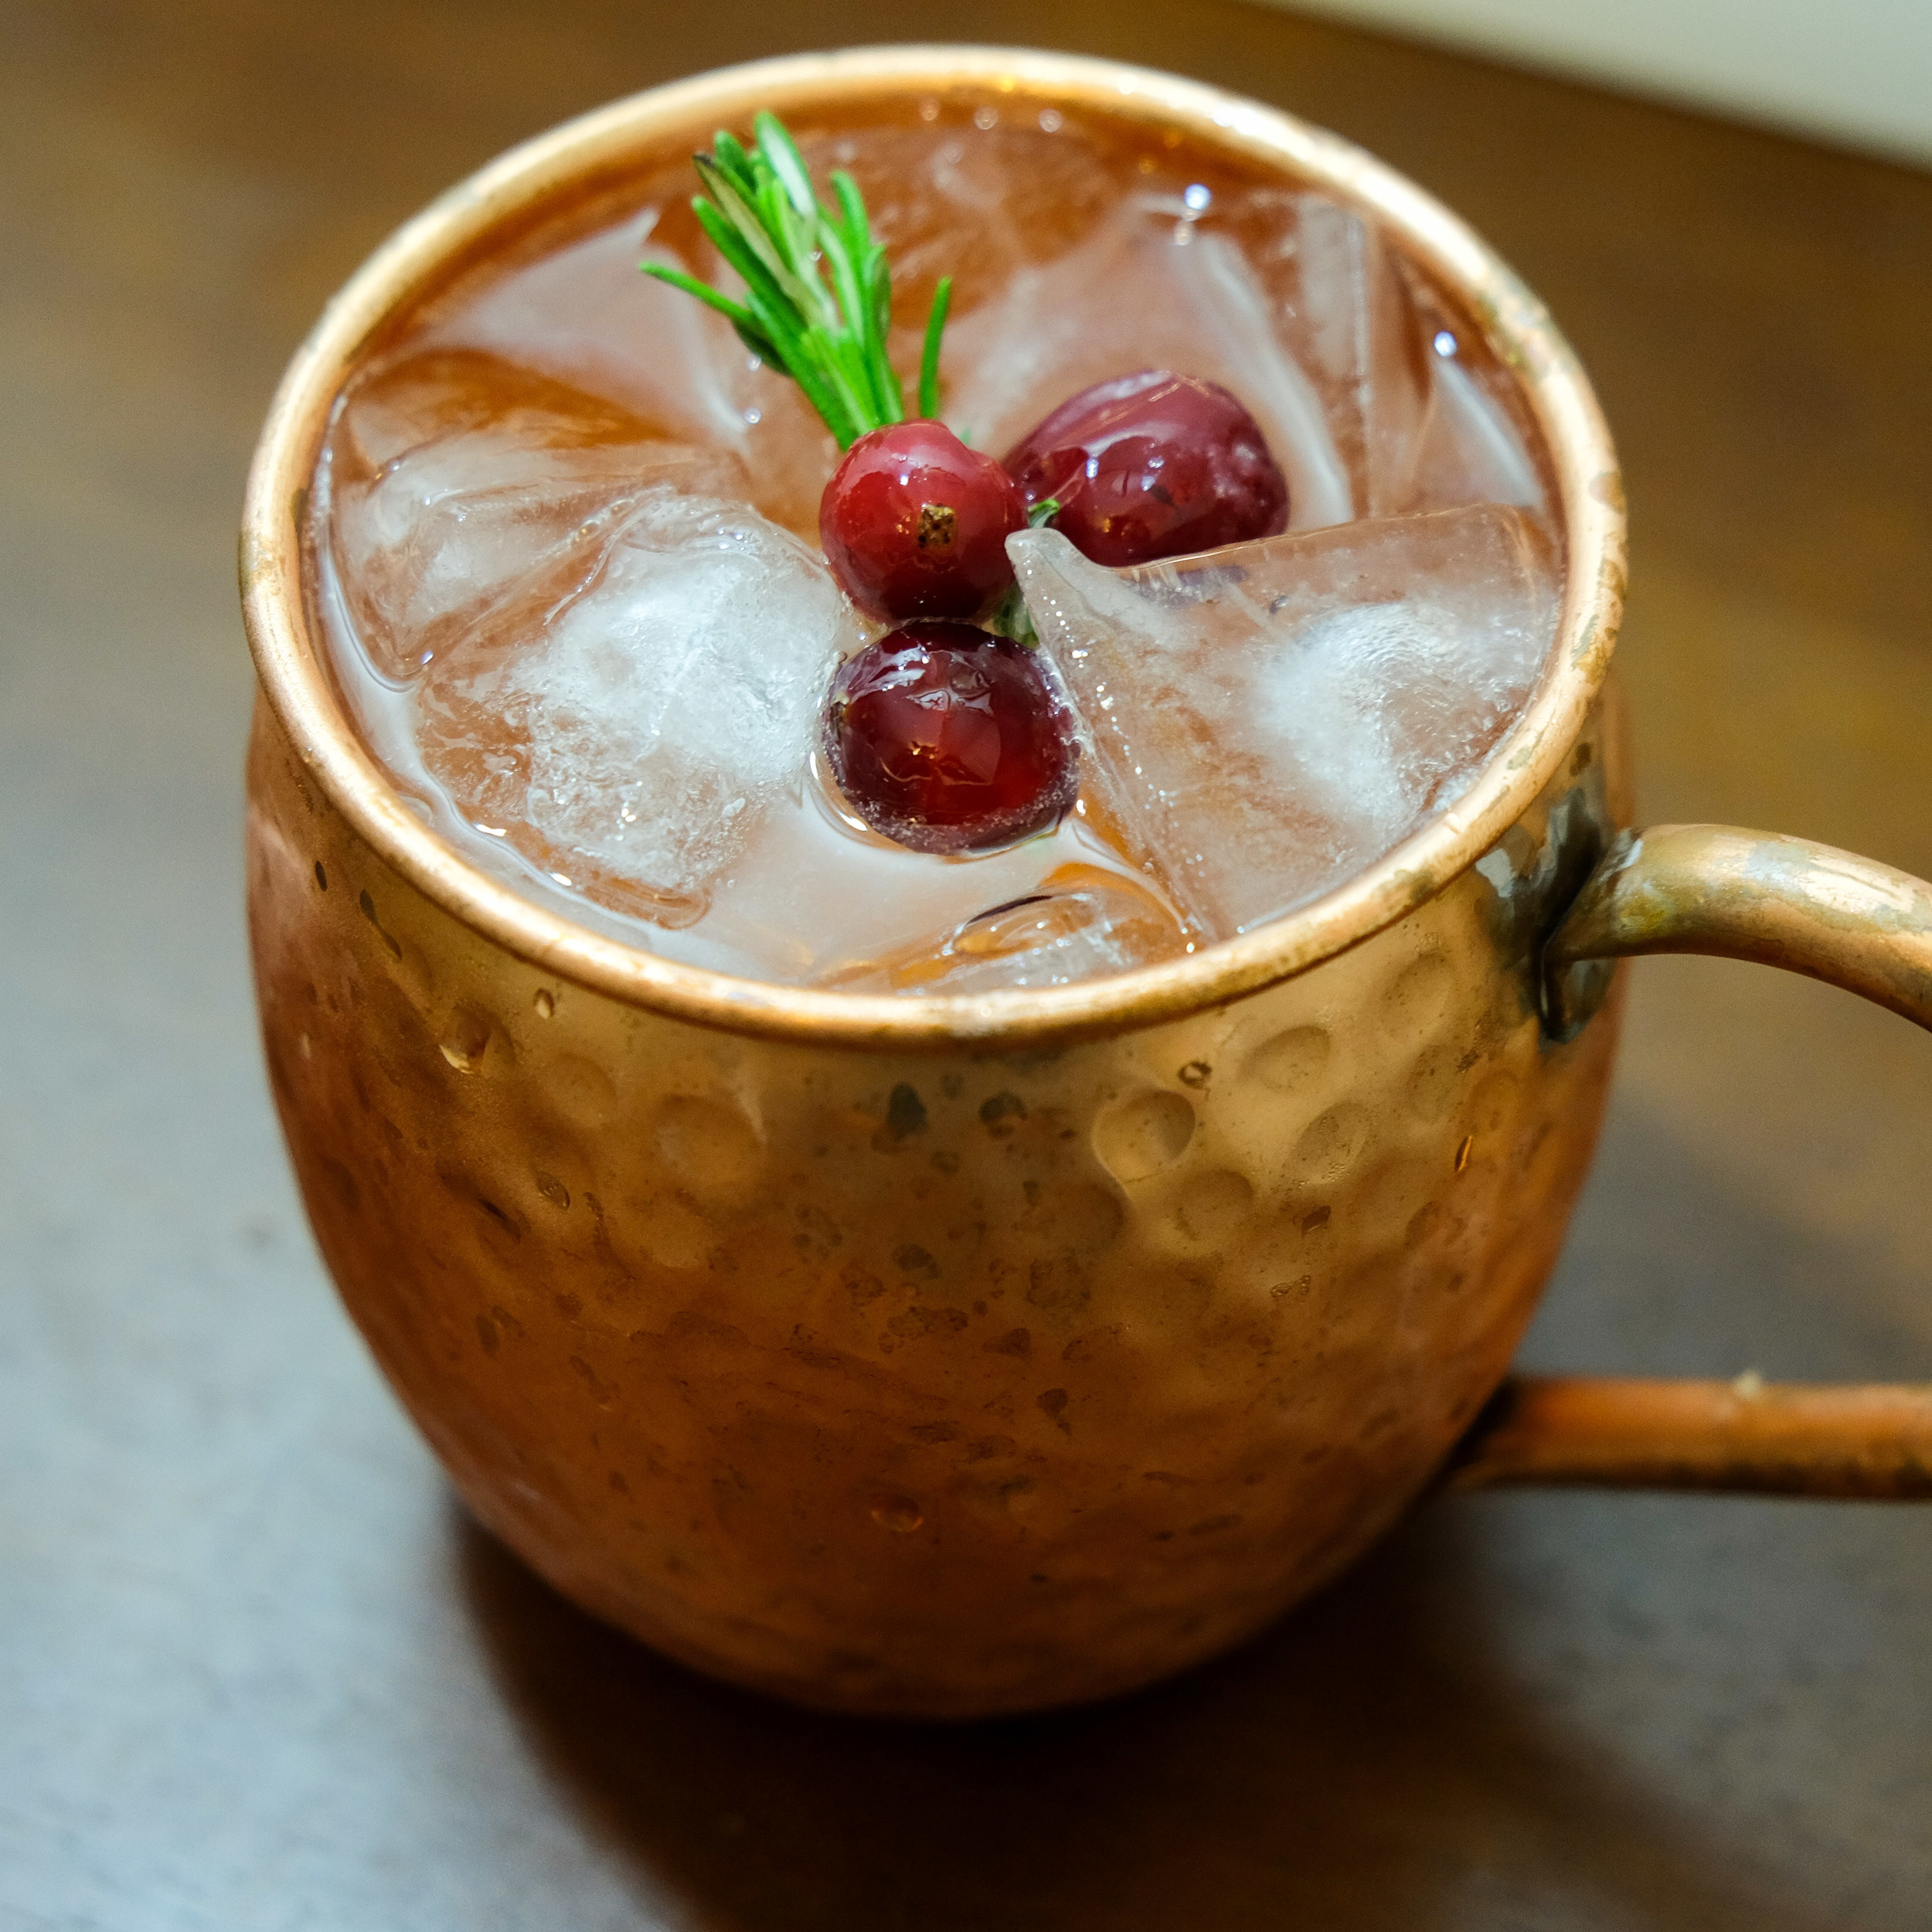 Cranberry & Rosemary mule